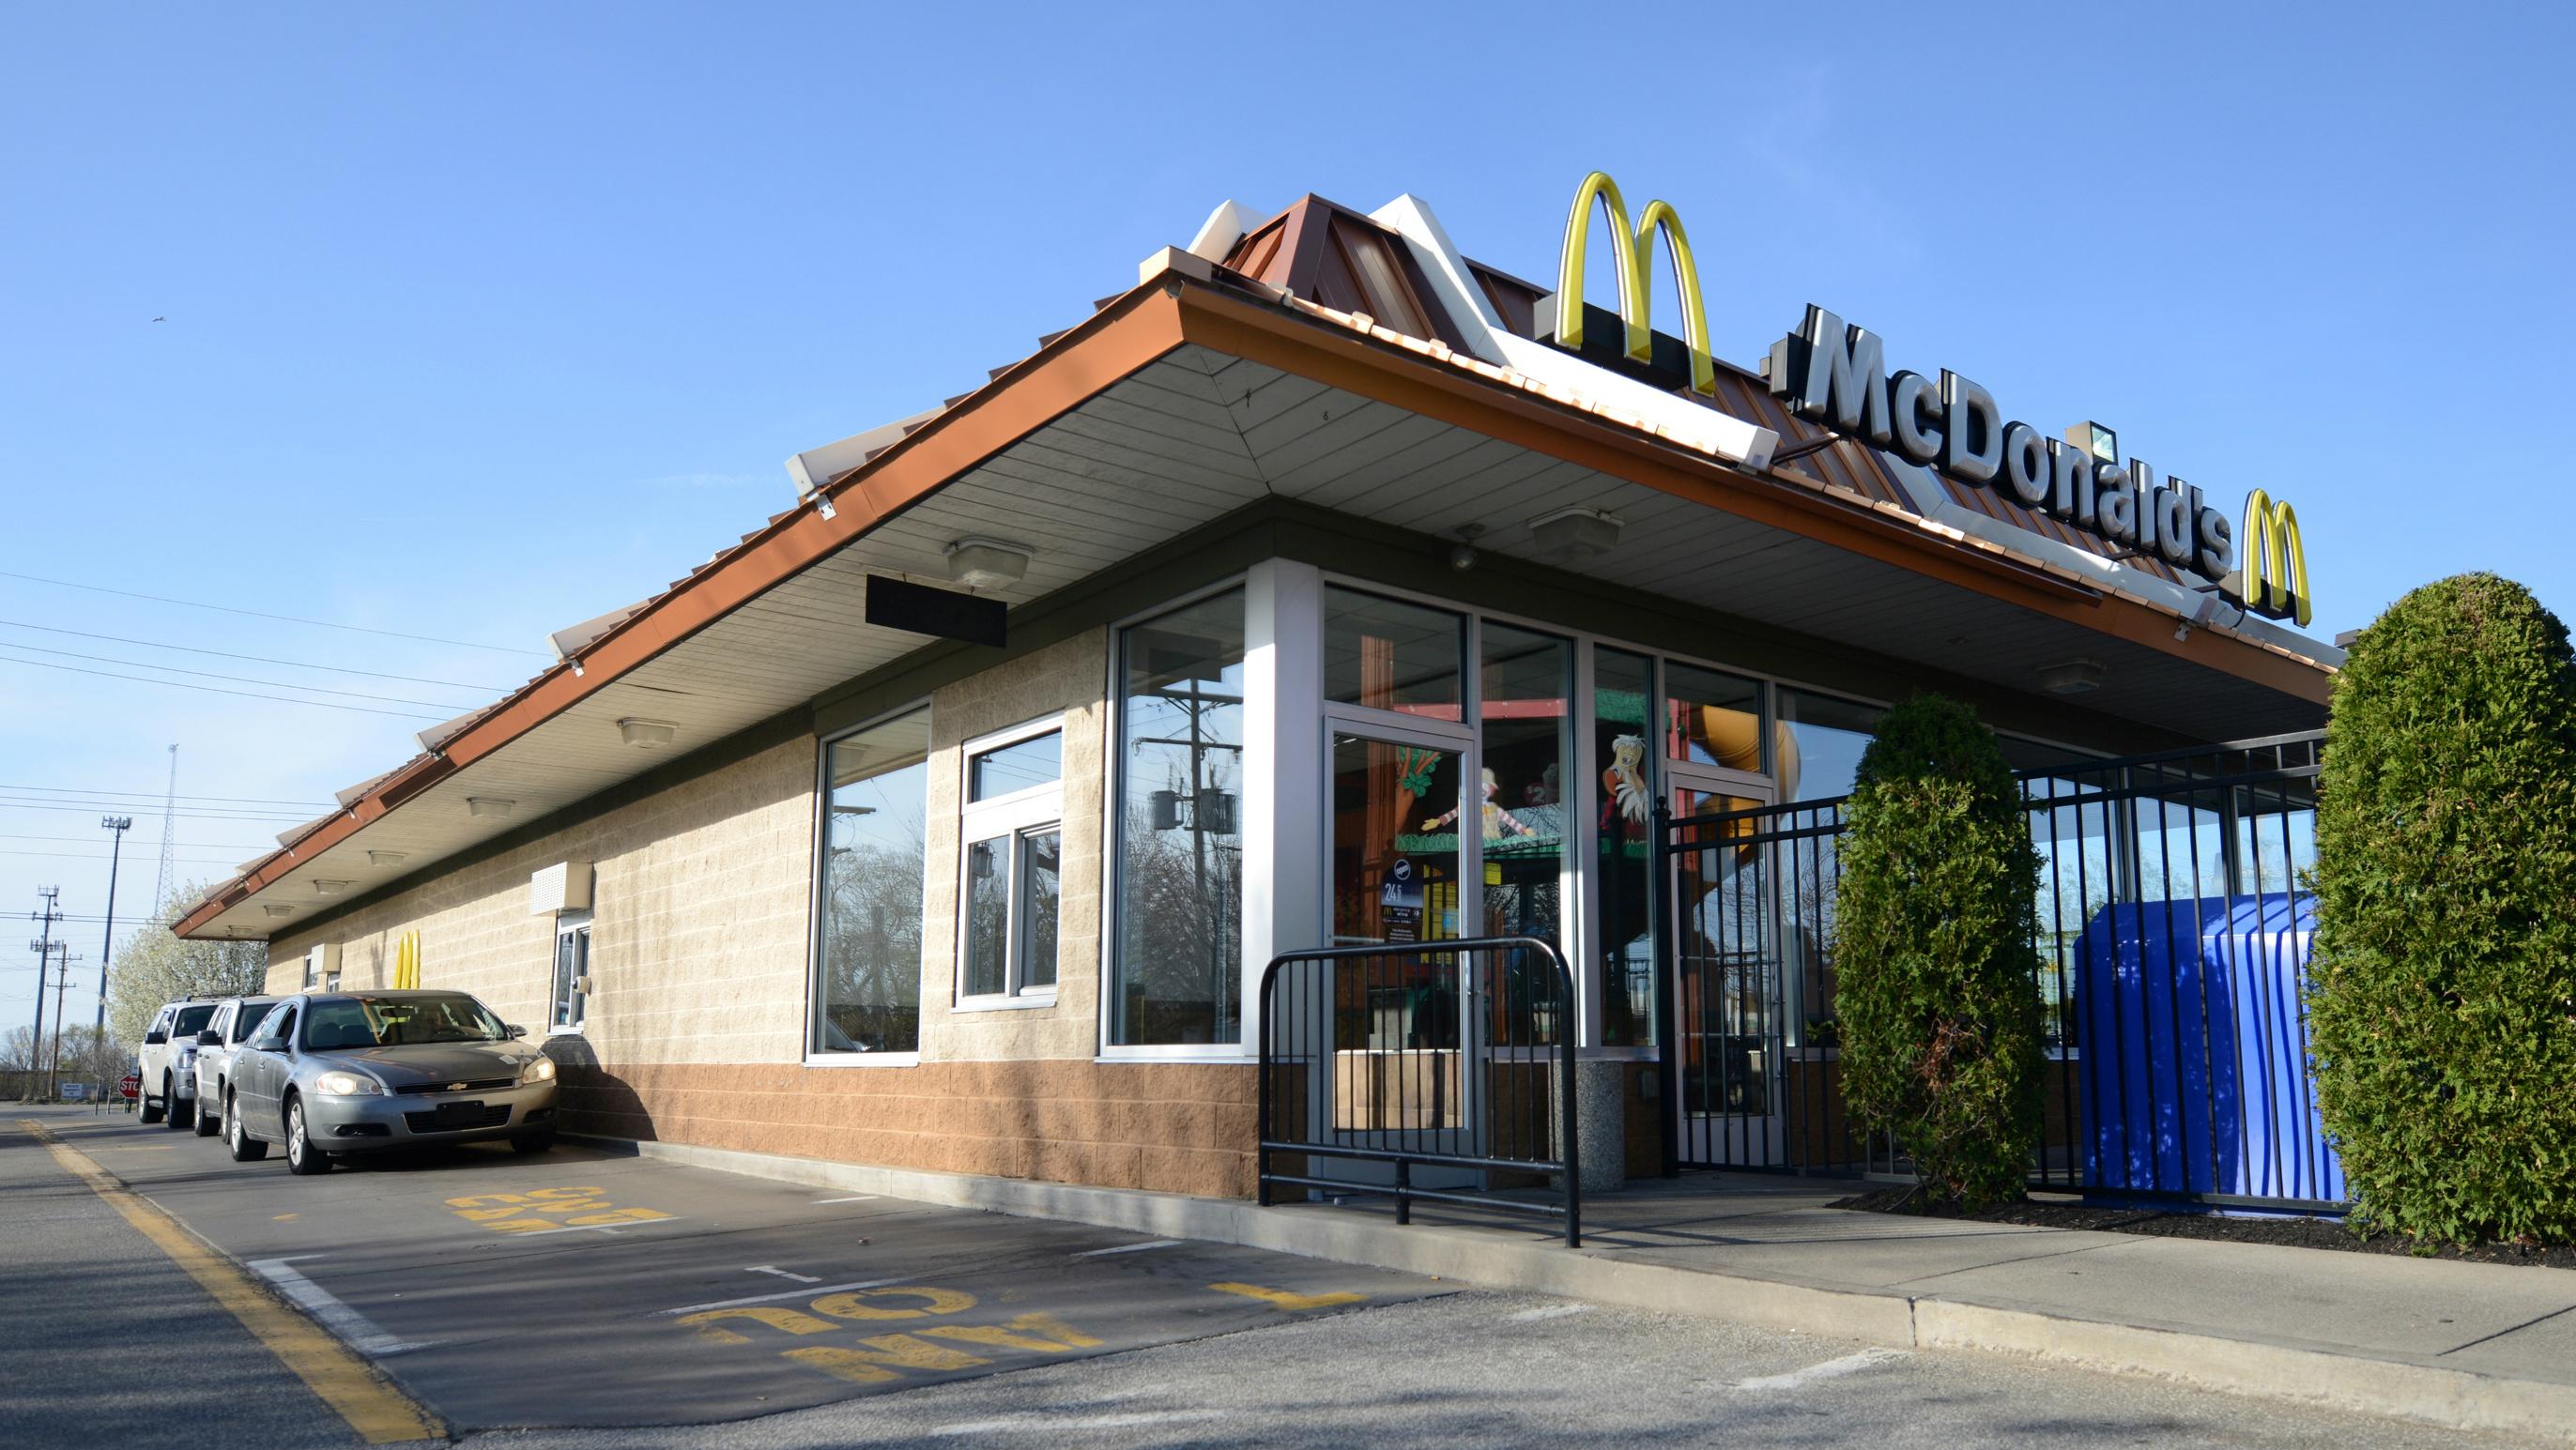 McDonald's (MCD) isn't really a fast food chain, it's a brilliant